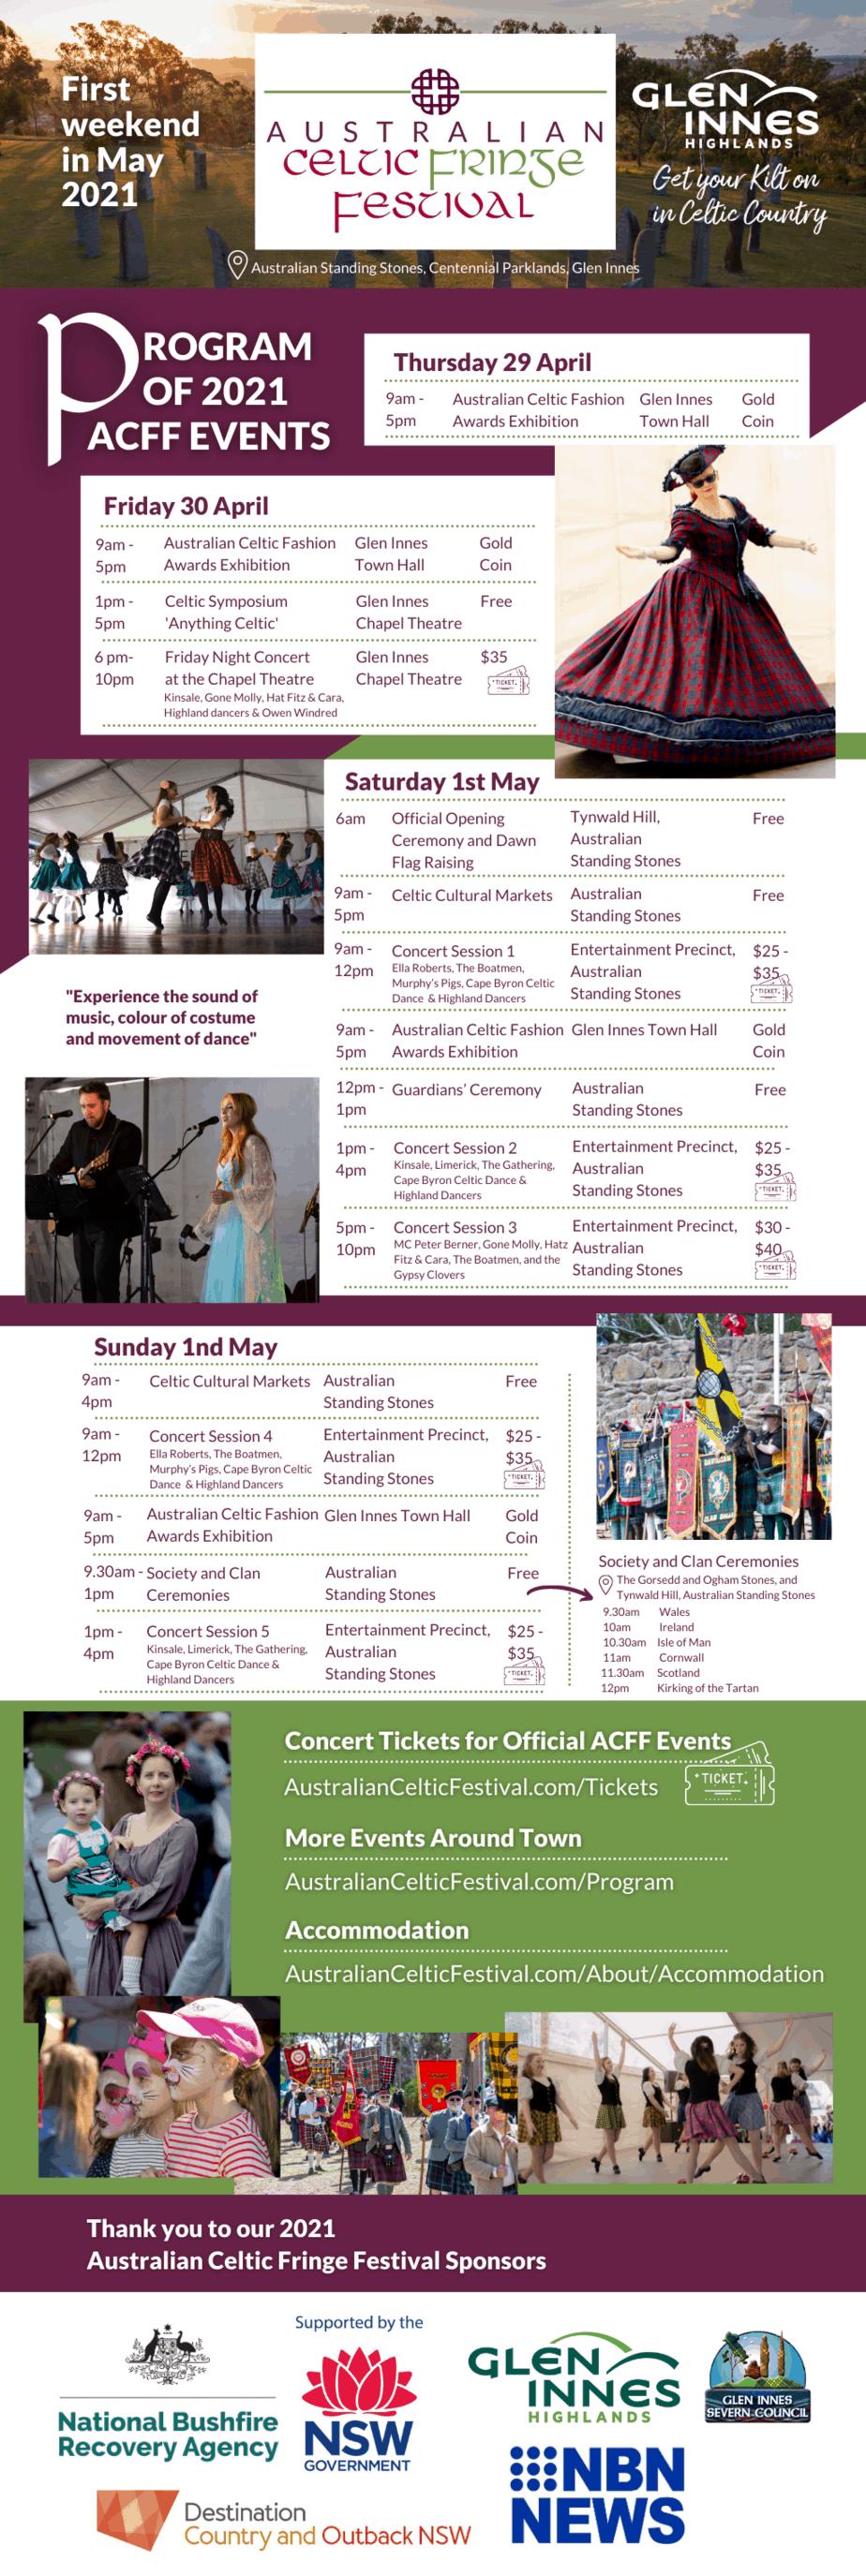 2021 ACFF Program Infographic